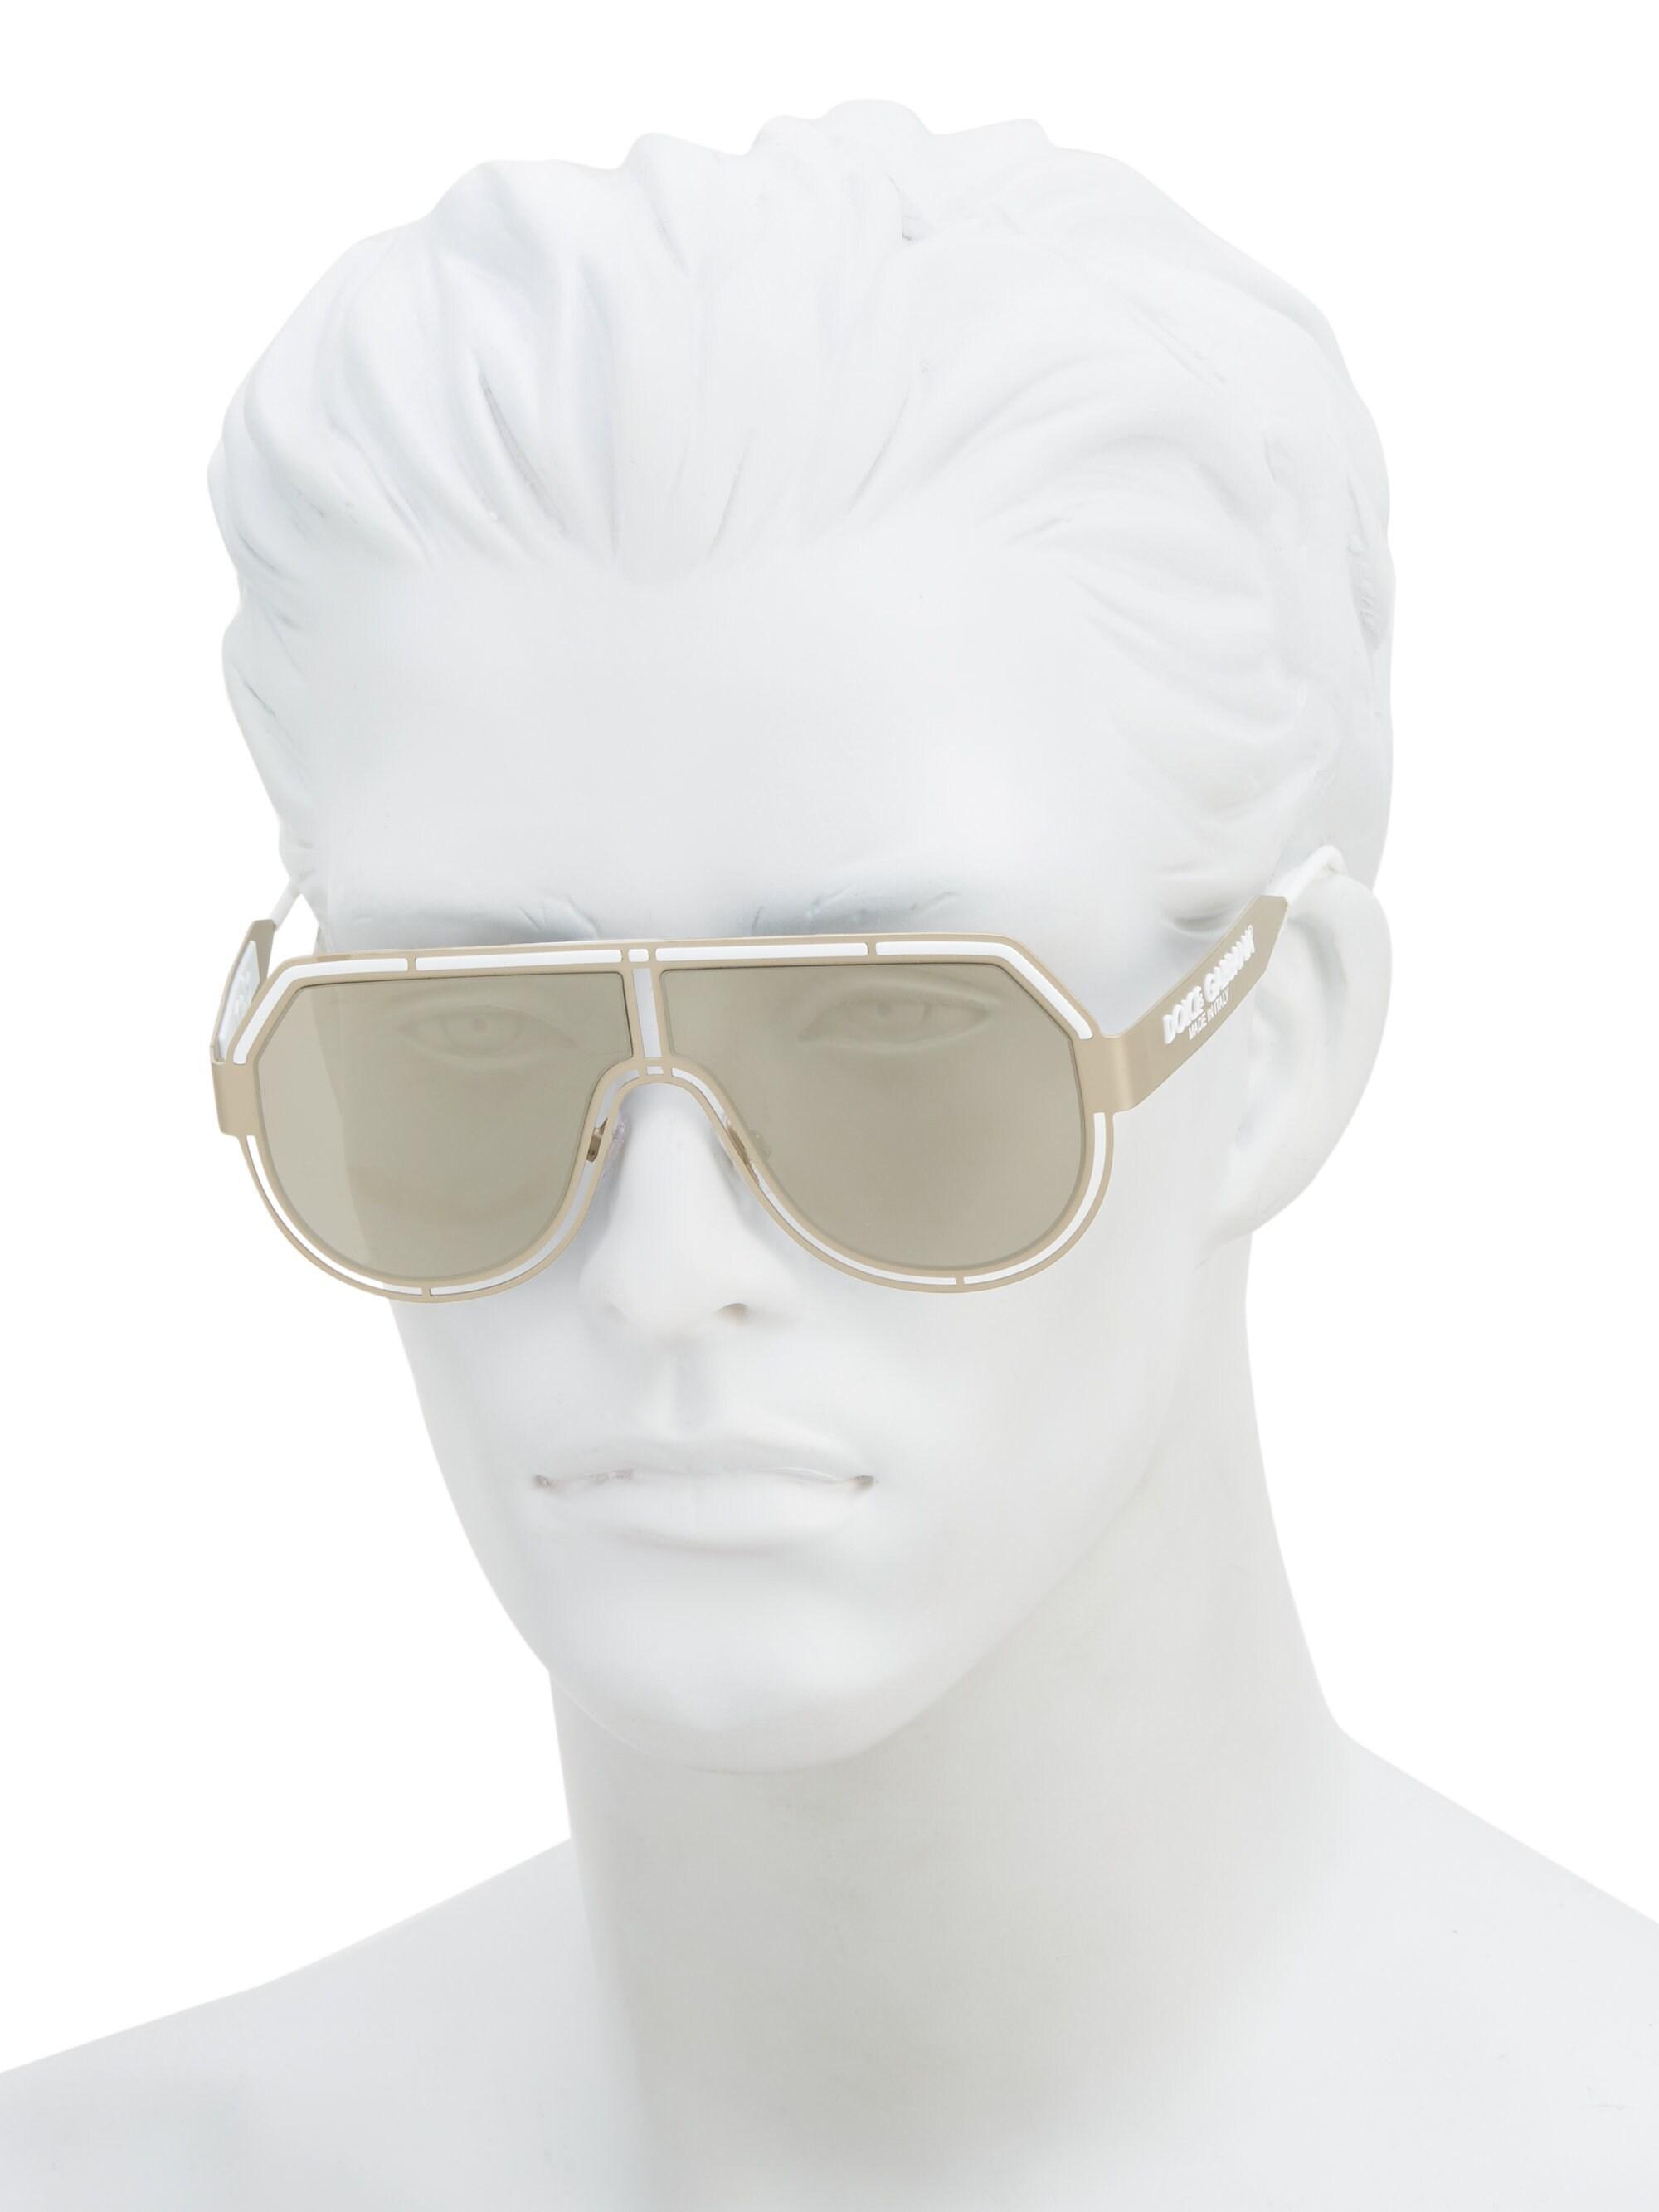 851100d1bc1e Dolce & Gabbana - Metallic Men's Charisma 59mm Mirrored Aviator Sunglasses  - Pale Gold for Men. View fullscreen